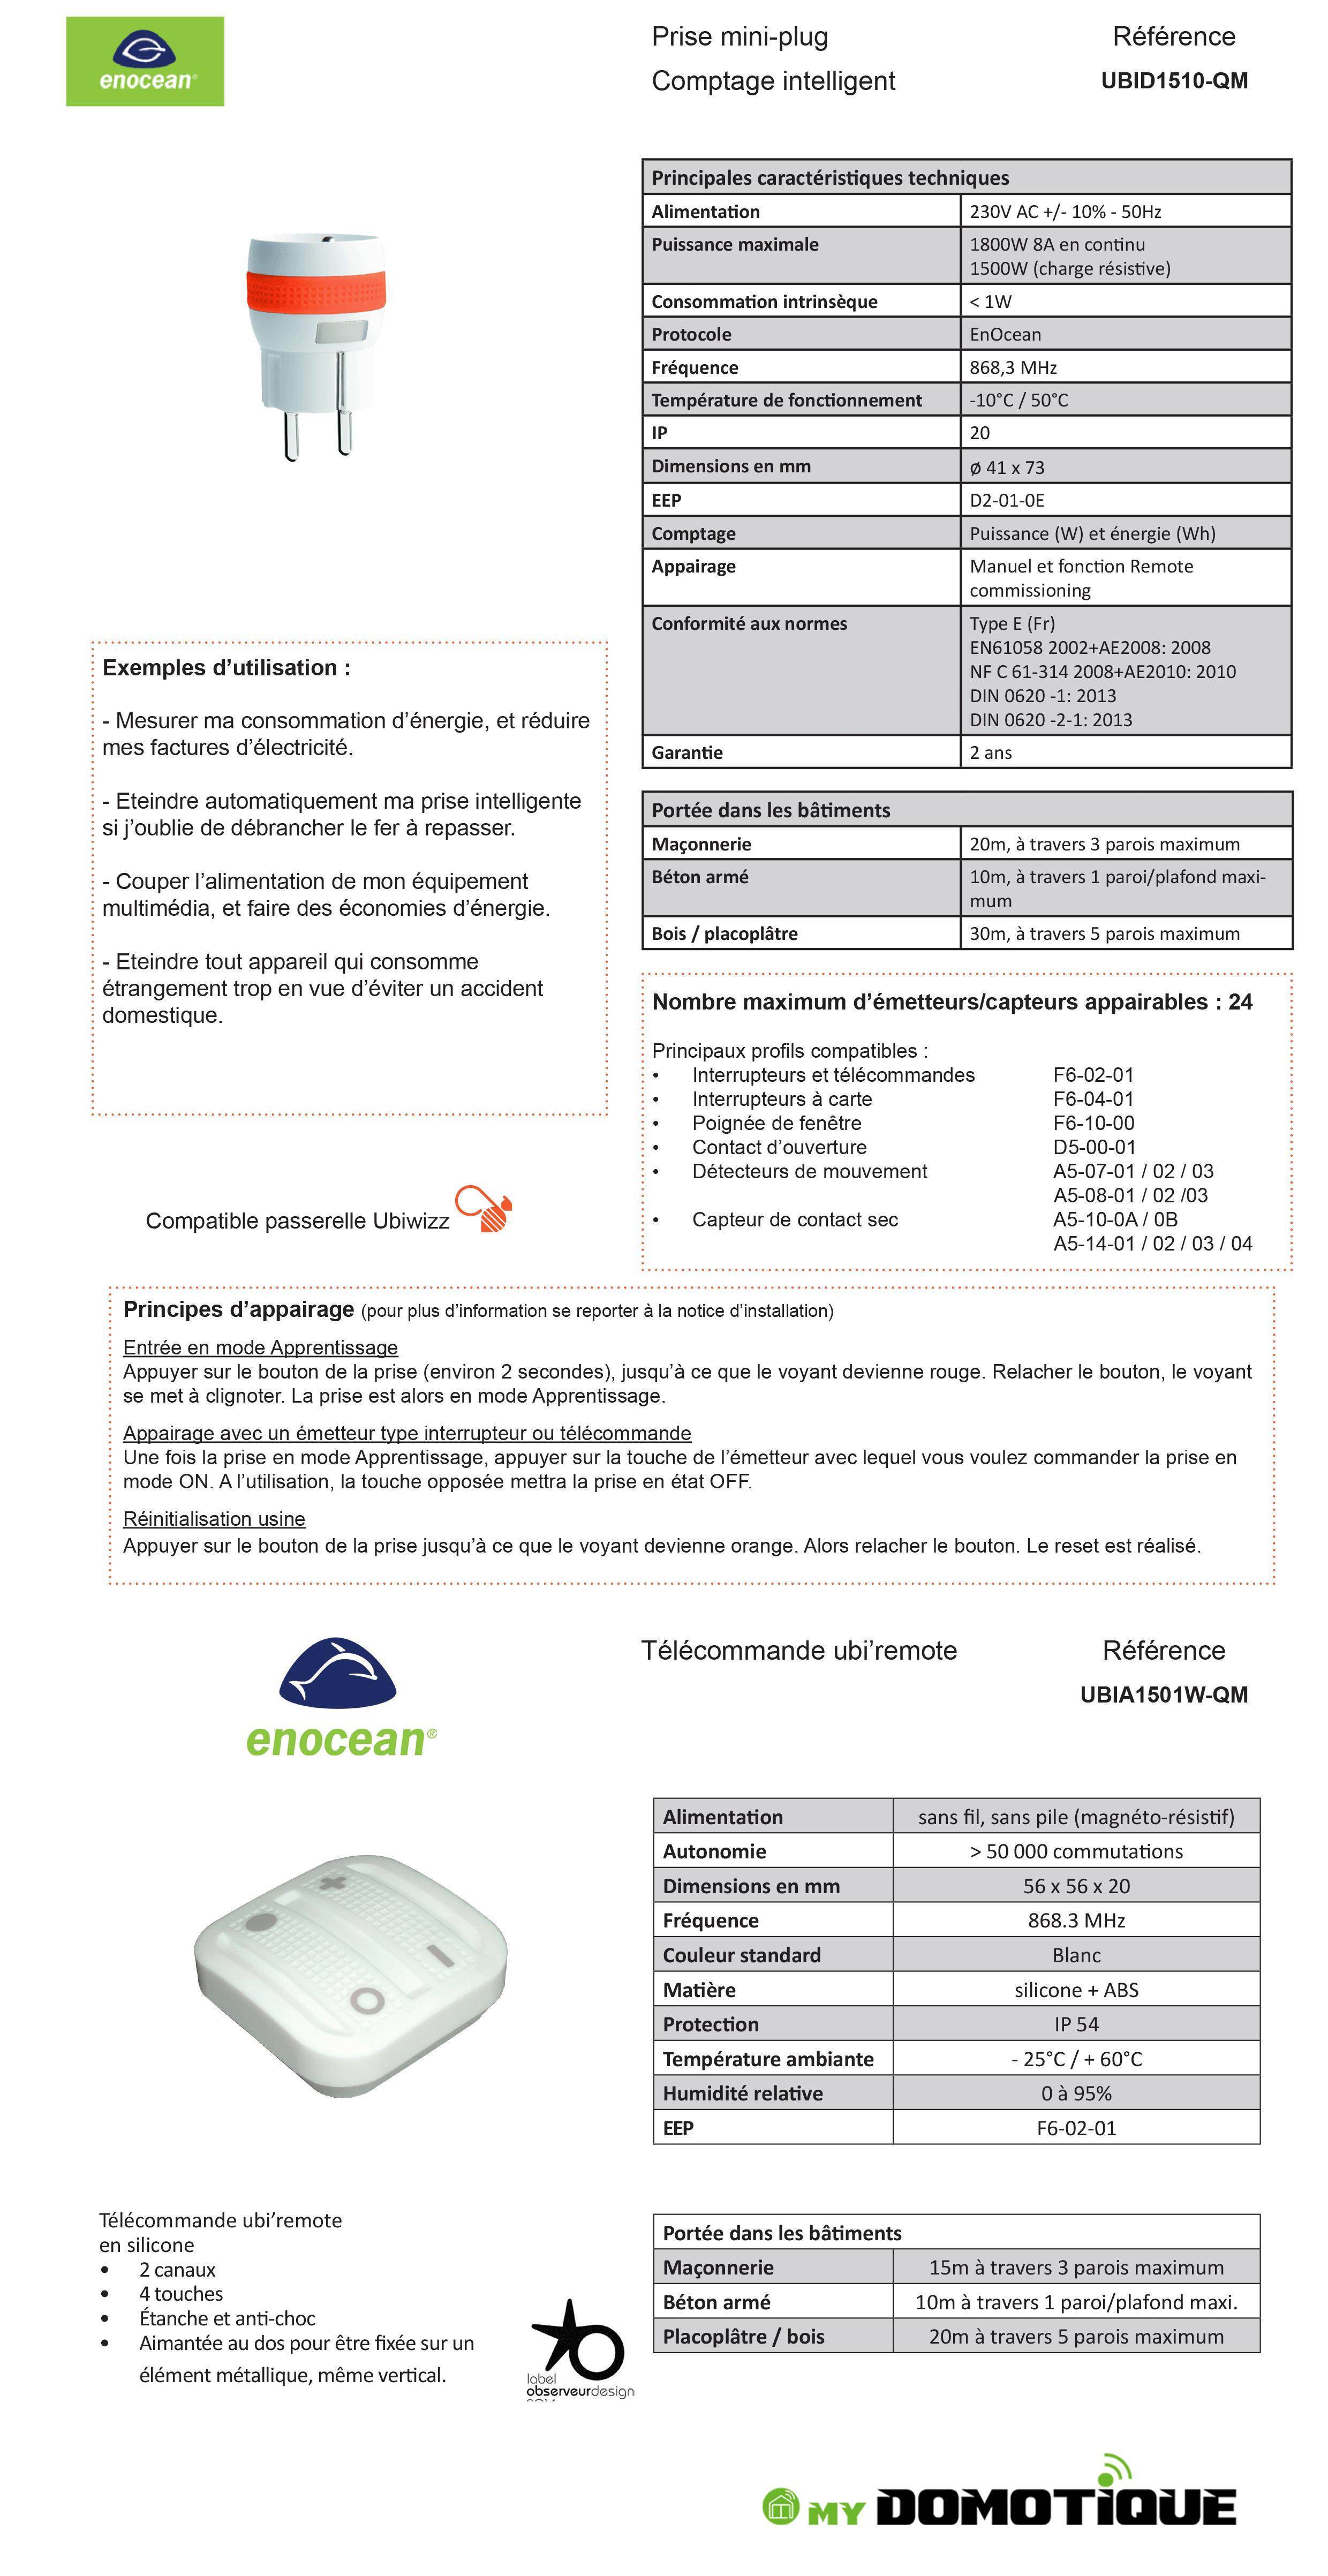 Prise mimi-plug Comptage intelligent UBID1510-QM Télécommande ubiremote UBIA1501W-QM.PNG